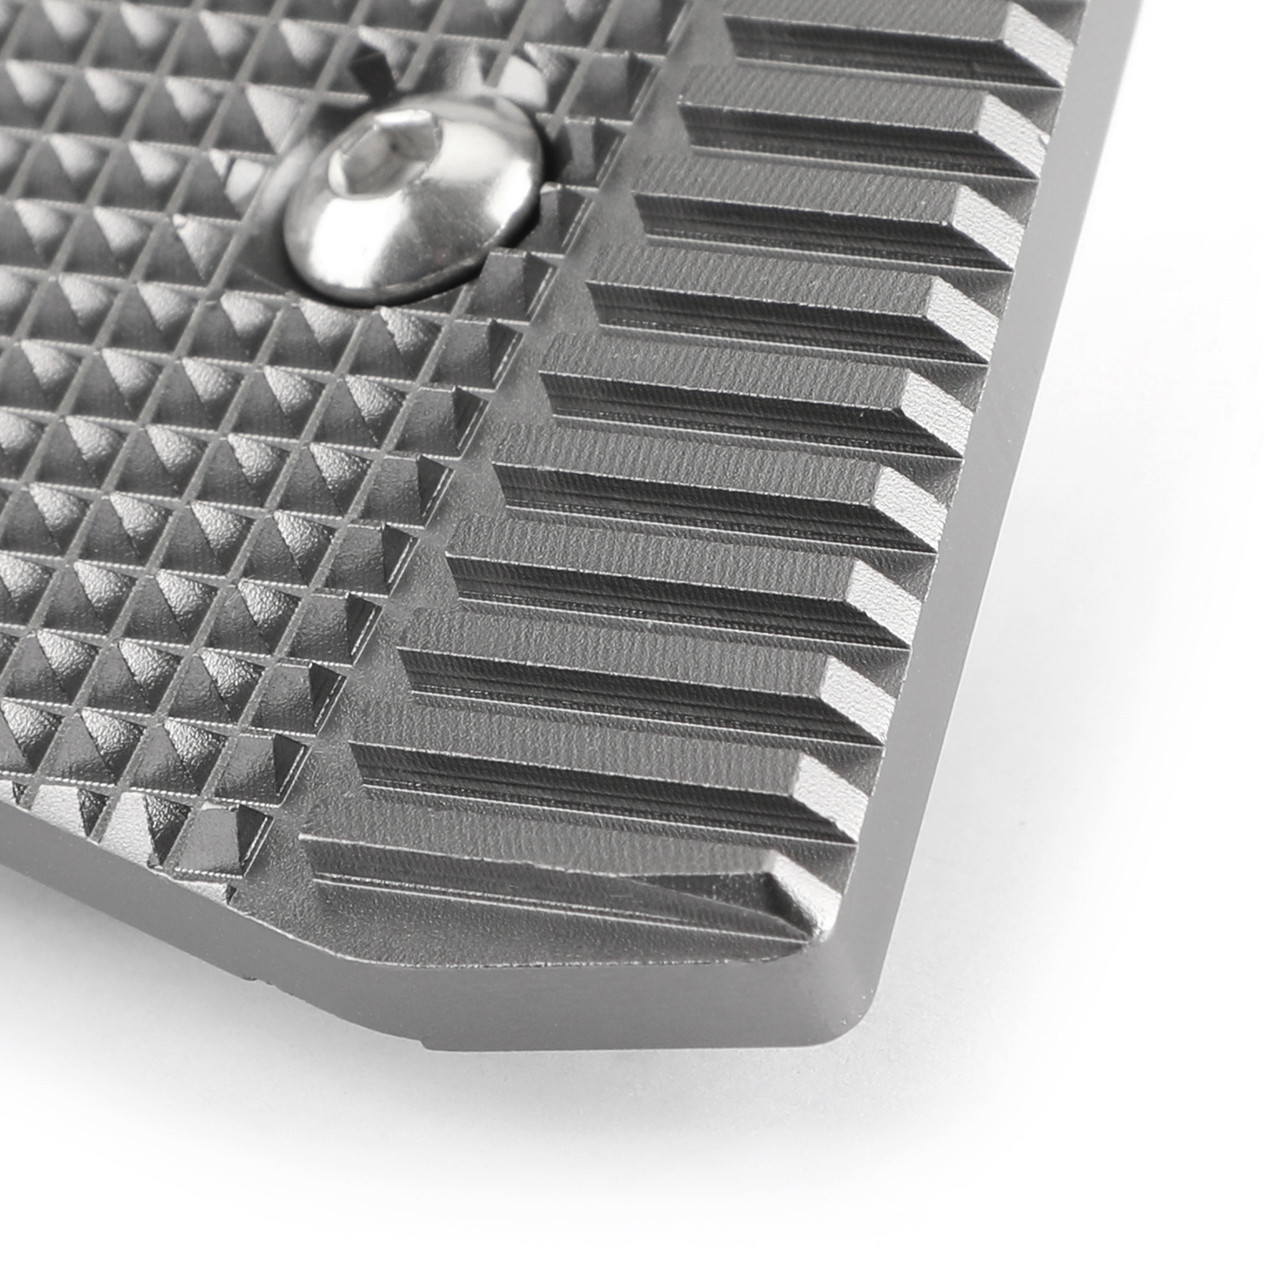 Rear Foot Brake Lever Pedal Extension Enlarge Pad Extender Fit For BMW G310R R nineT Scrambler 17-20 Titanium